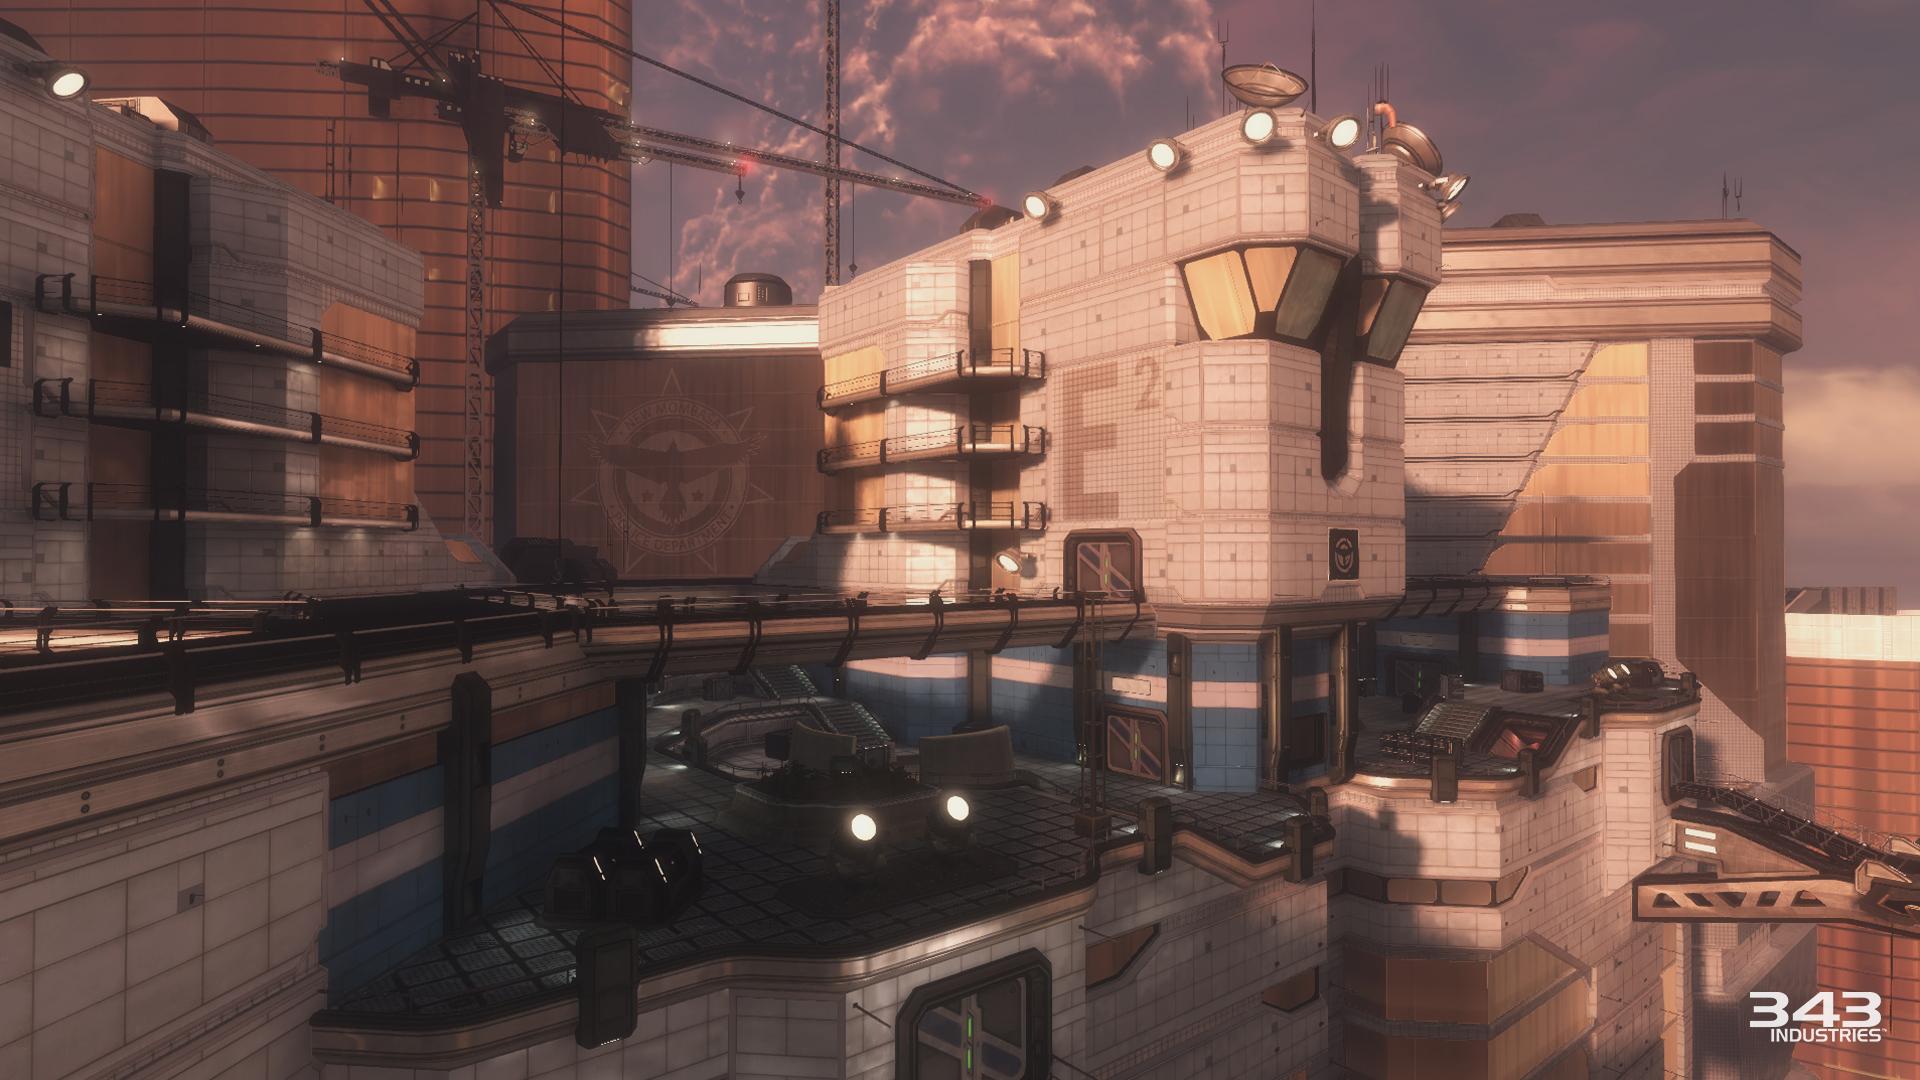 Vyšla kampaň Halo 3: ODST do Halo: The Master Chief Collection 109405